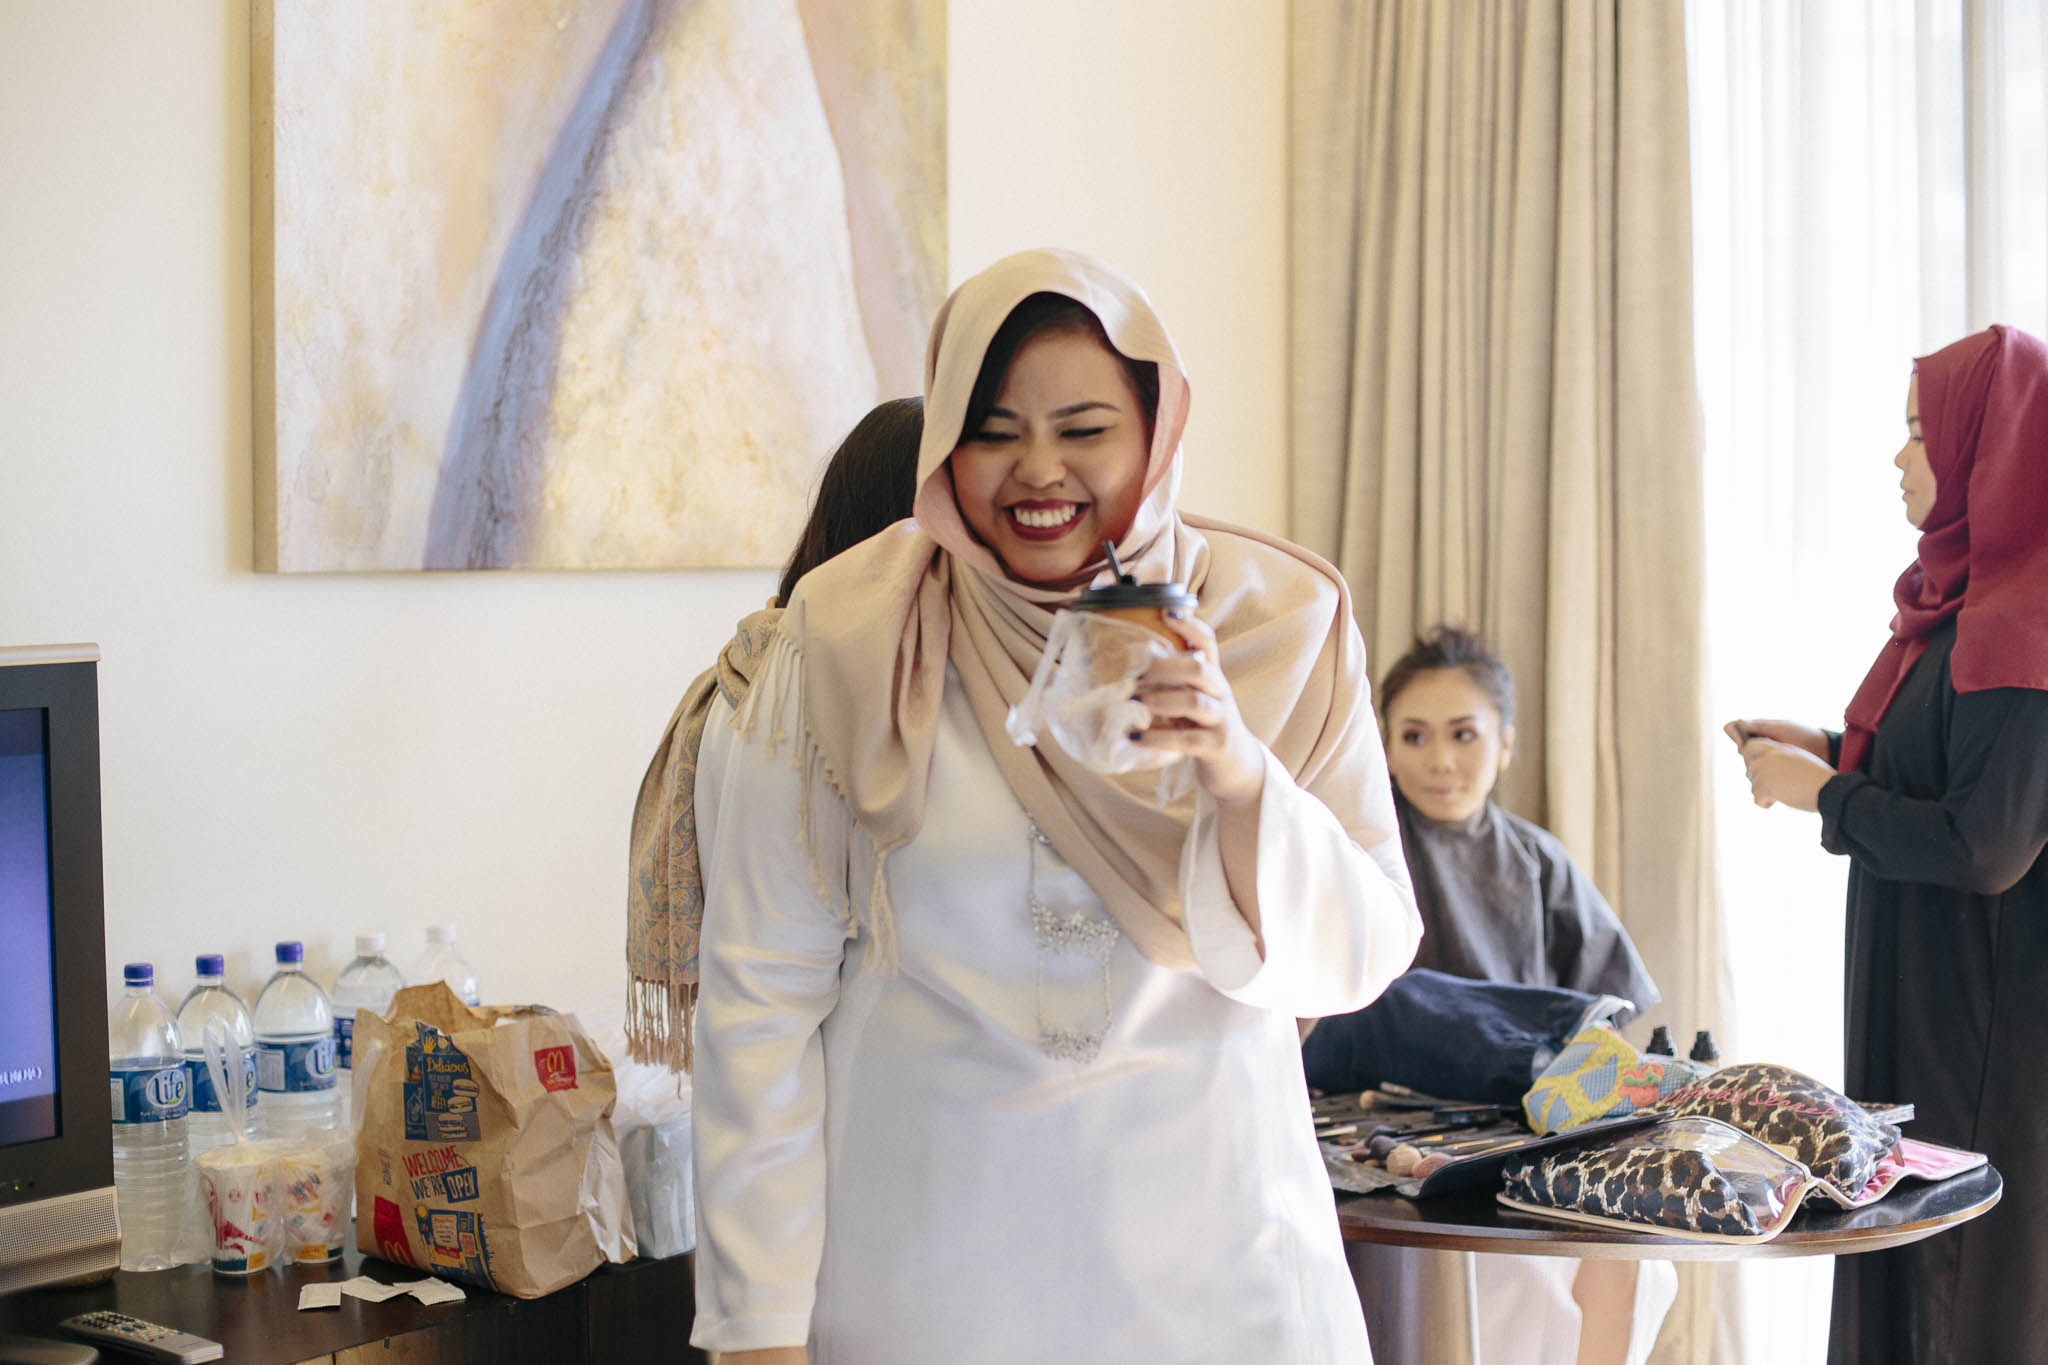 singapore-wedding-photographer-travel-khairul-atikah-03.jpg